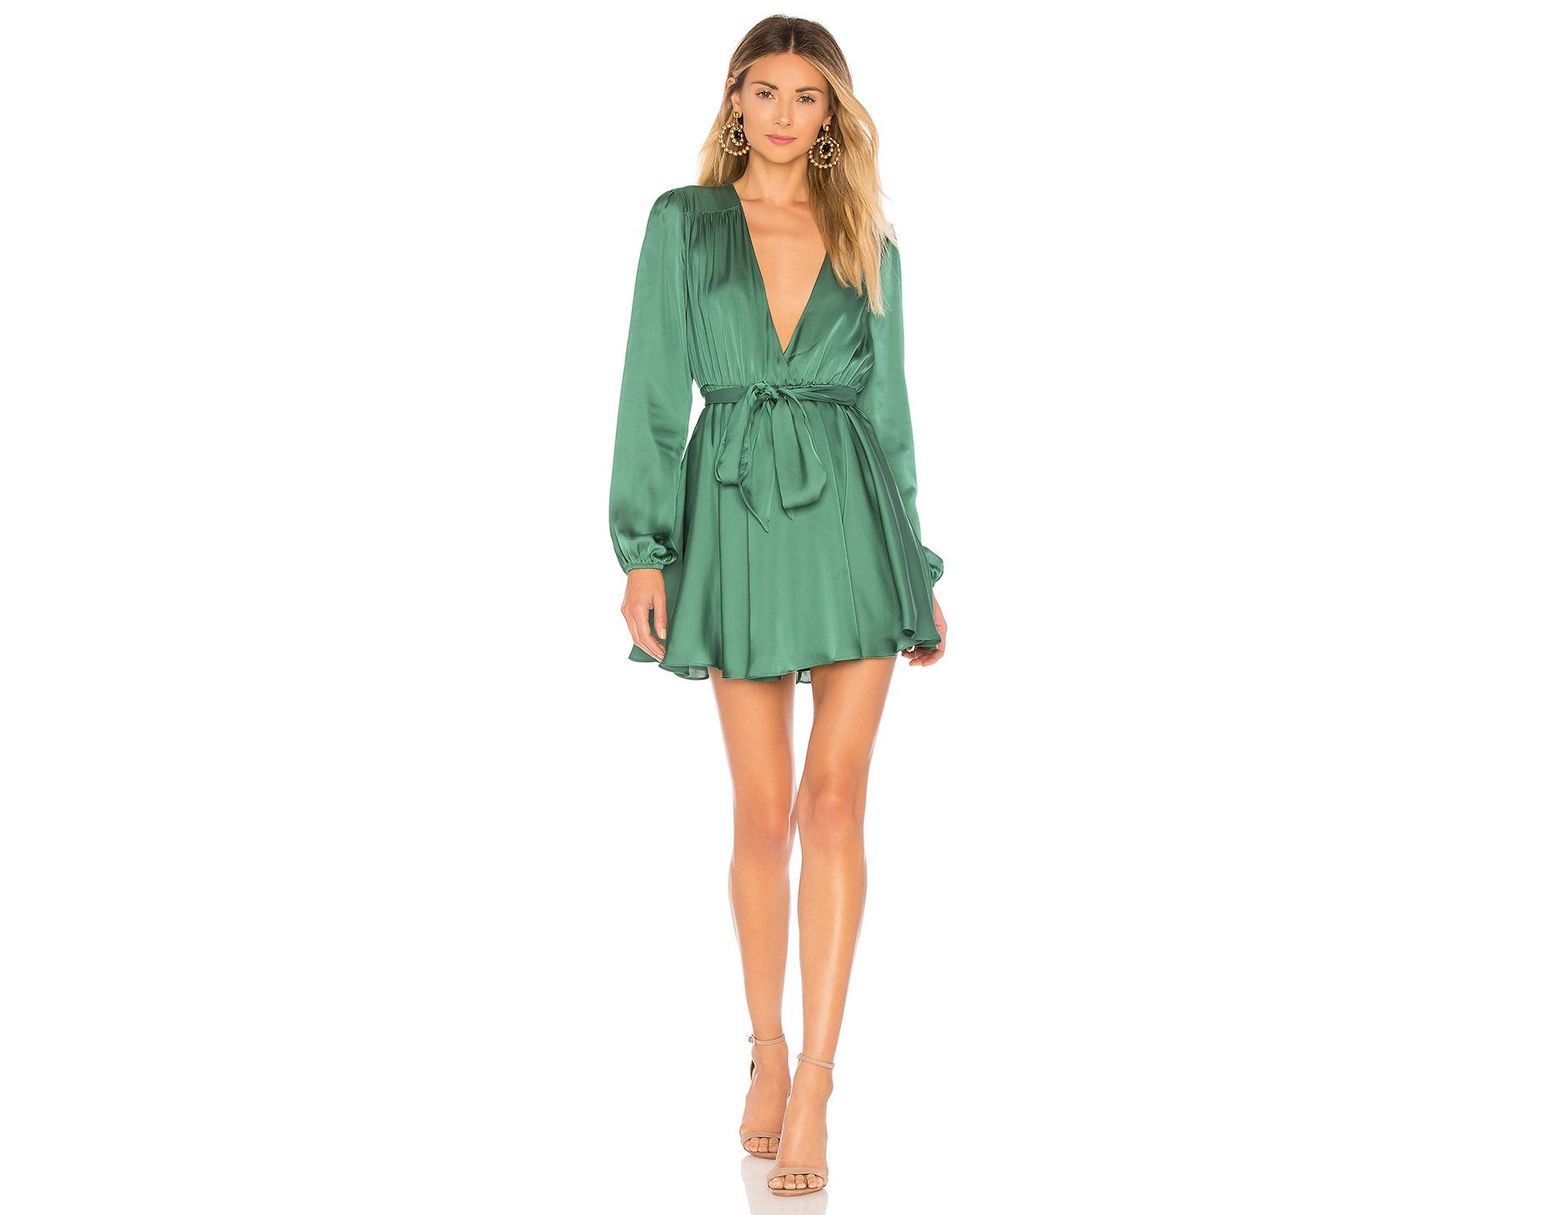 cbd6759edb64 Lovers + Friends Ivy Dress in Green - Lyst